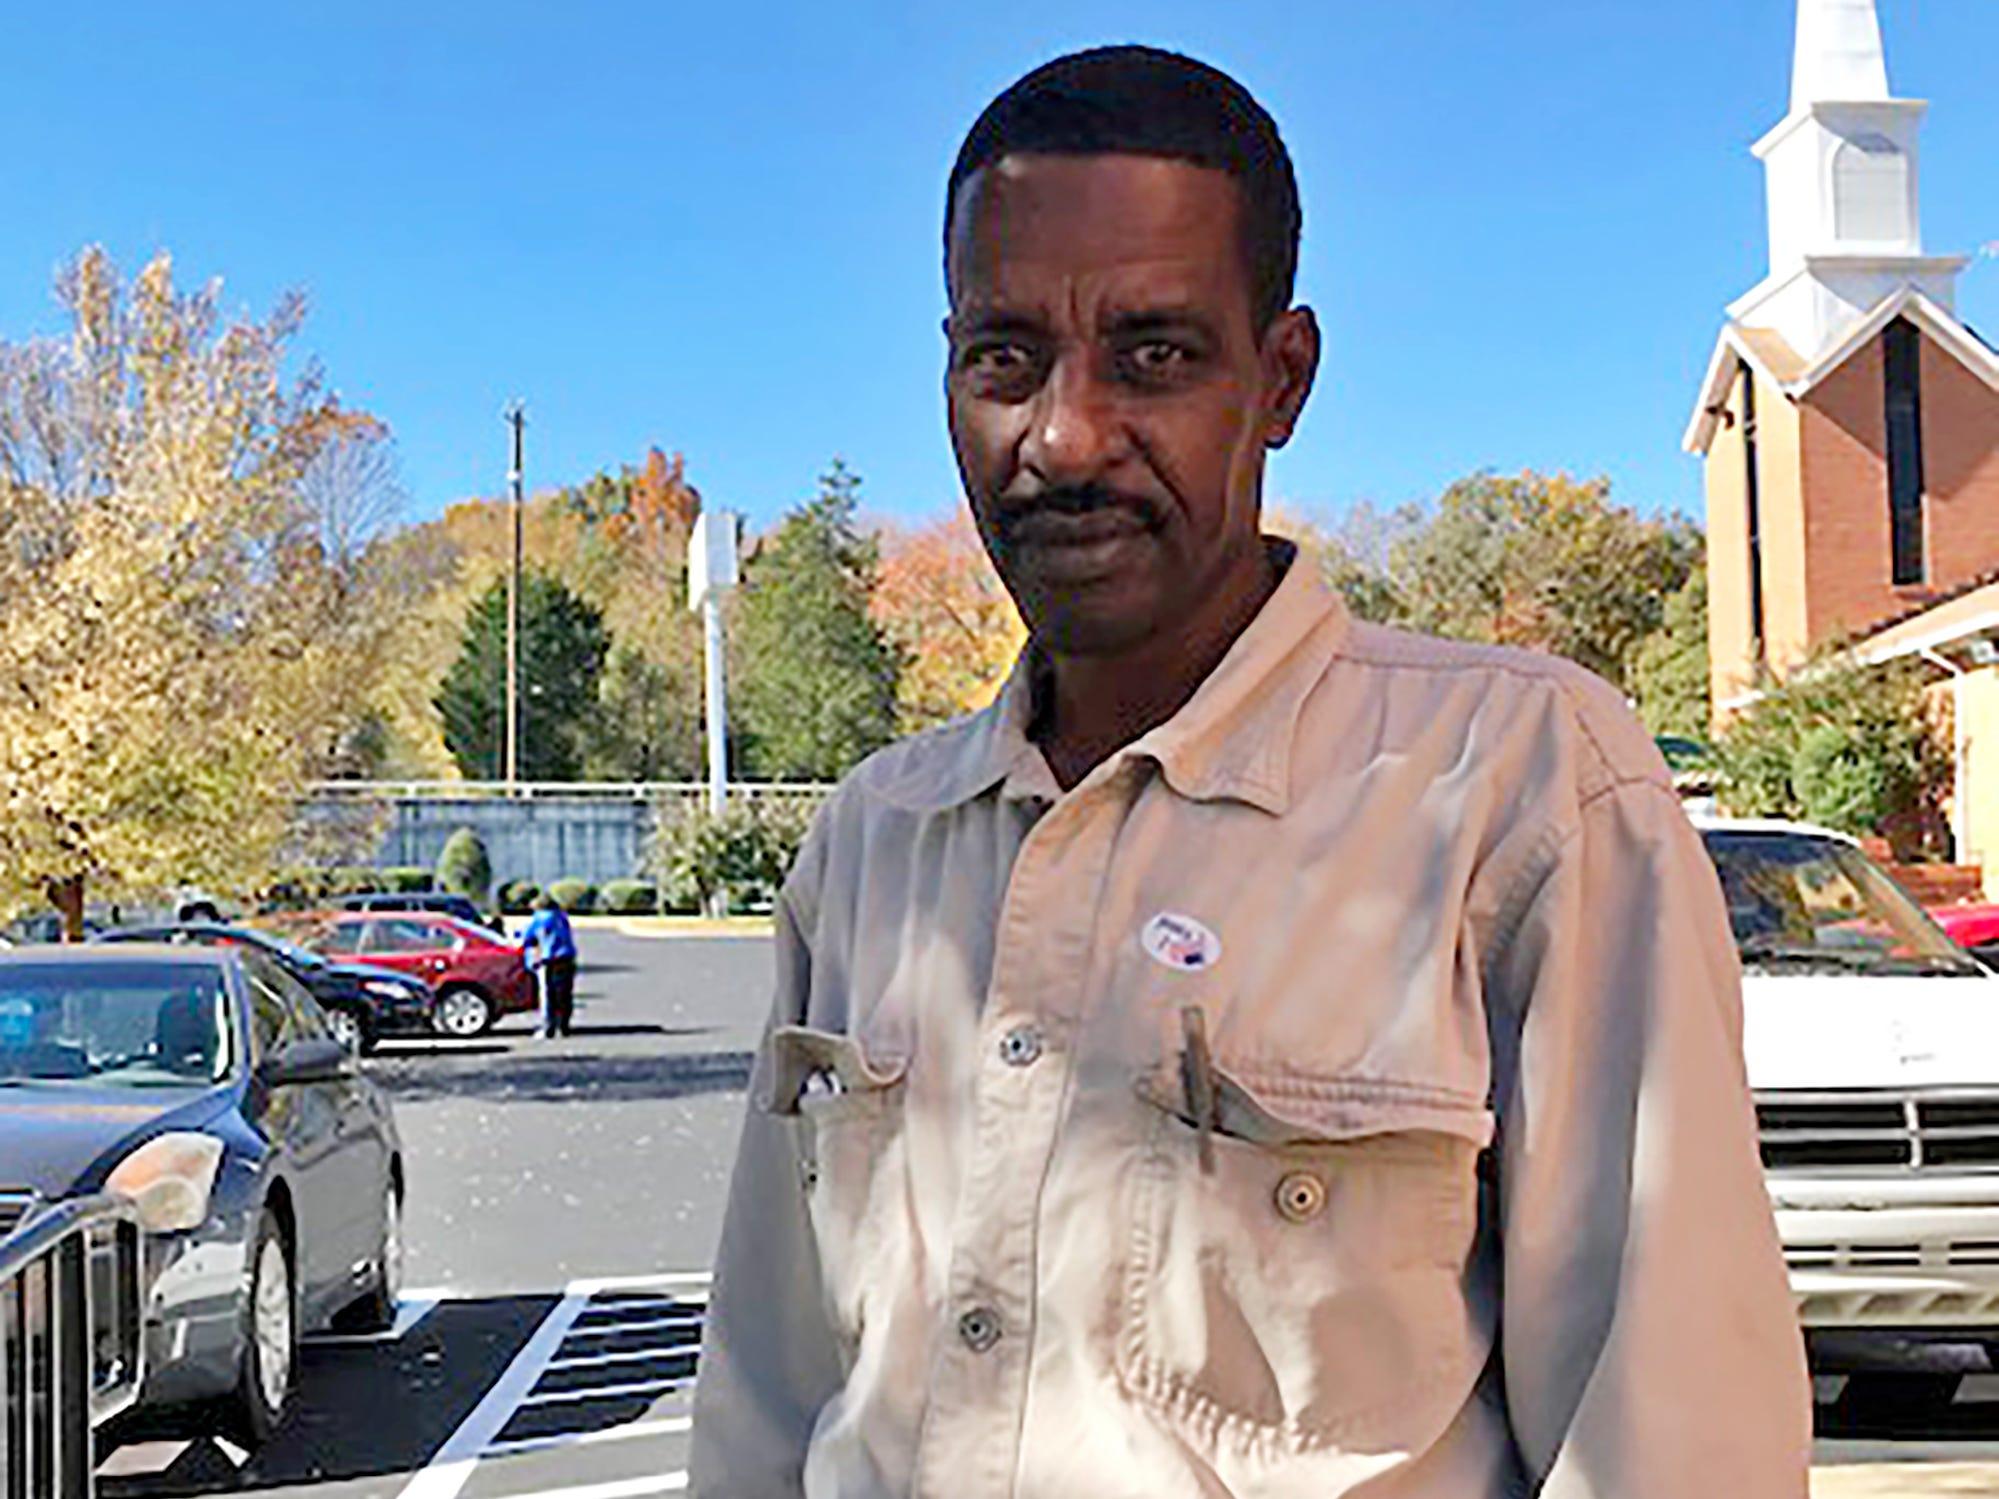 Abdi Radi, 54 Antioch resident voties at Rural Hill Church of Christ Tuesday, Nov. 6, 2018 in Nashville, Tenn..